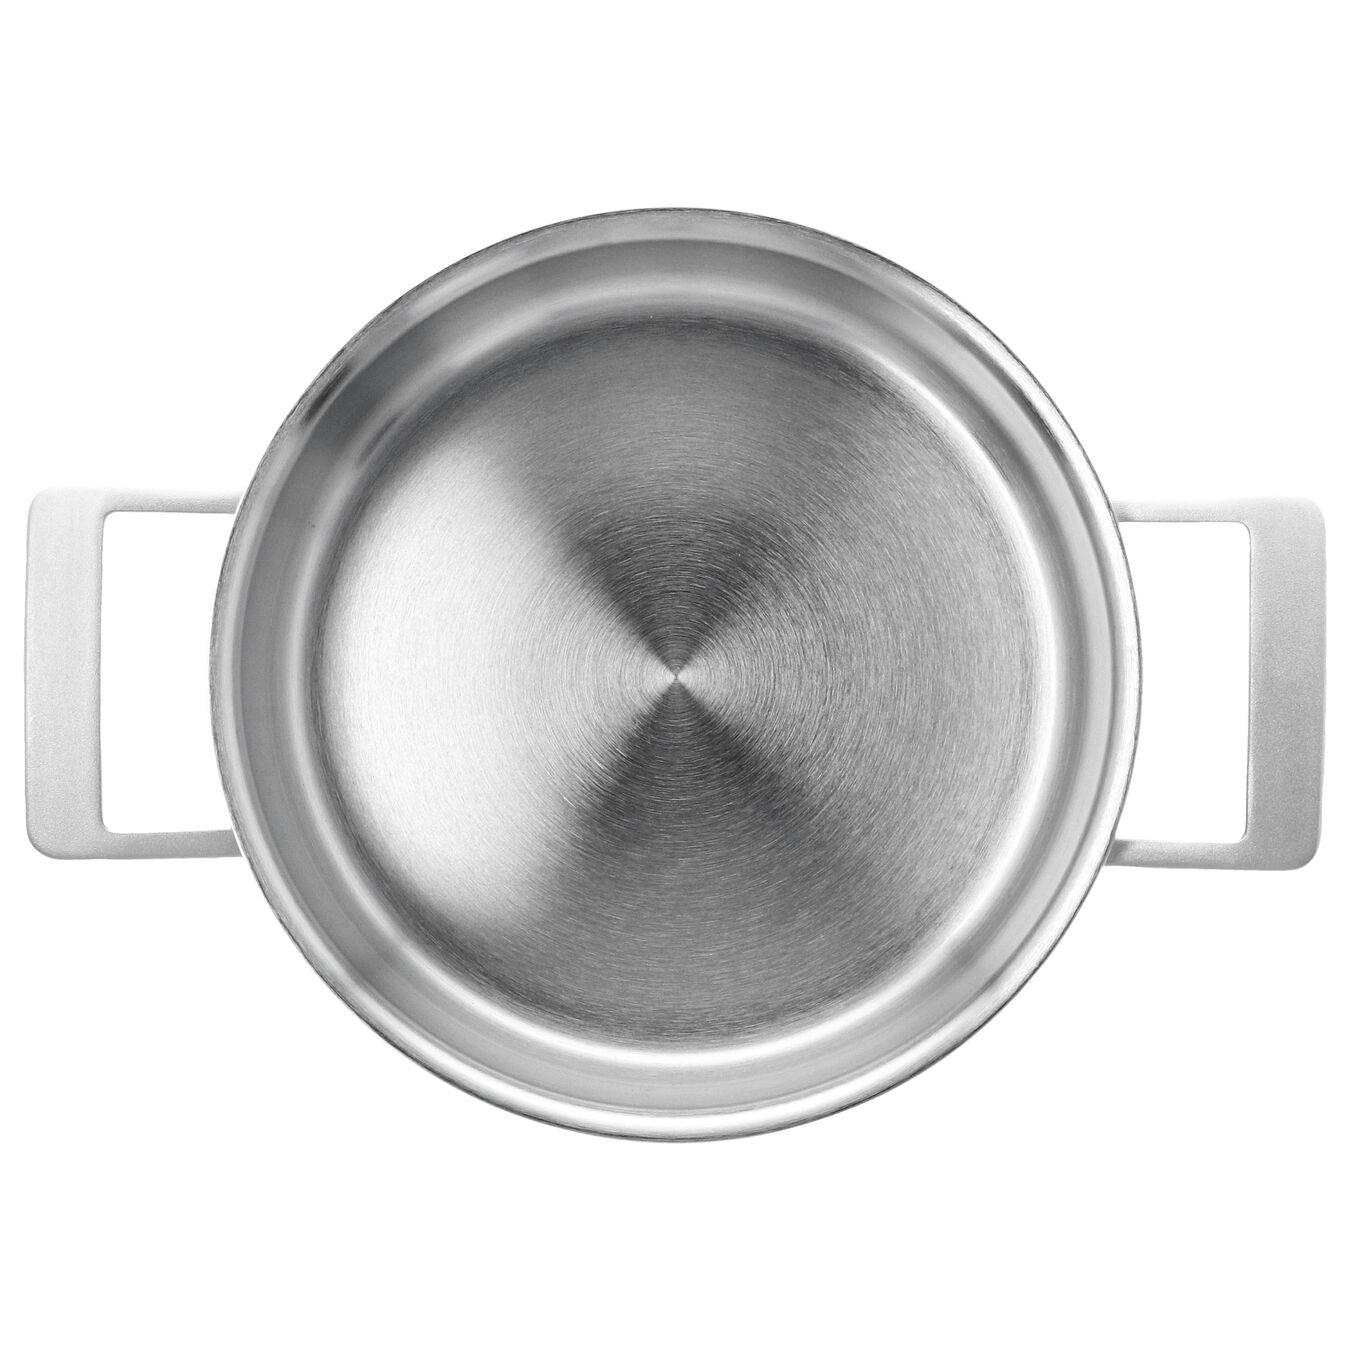 Kookpot met deksel, 24 cm / 3,8 l,,large 2